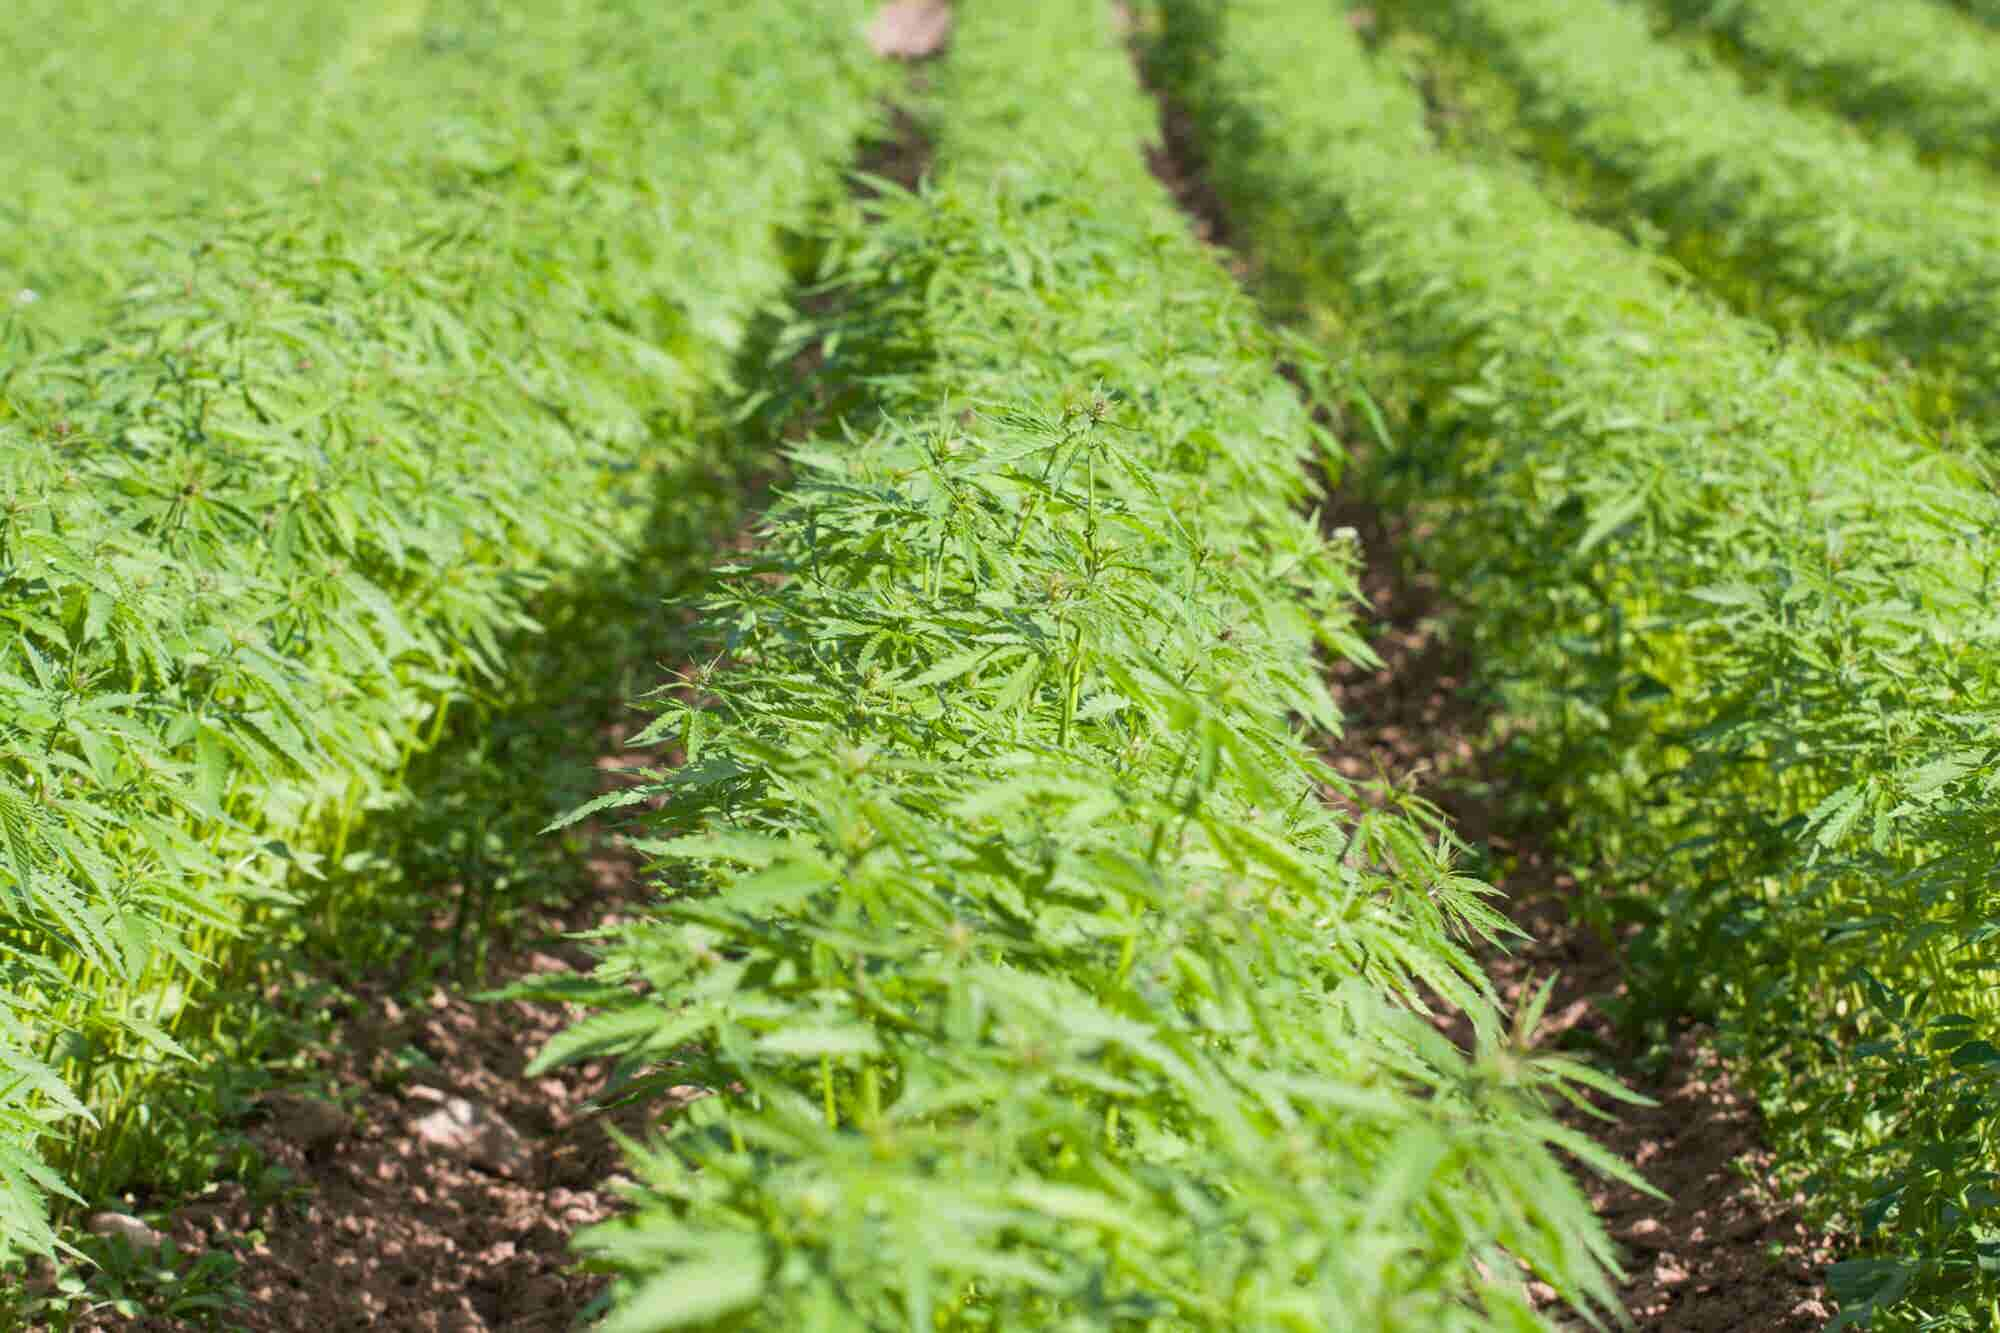 An Argument for Farming Hemp